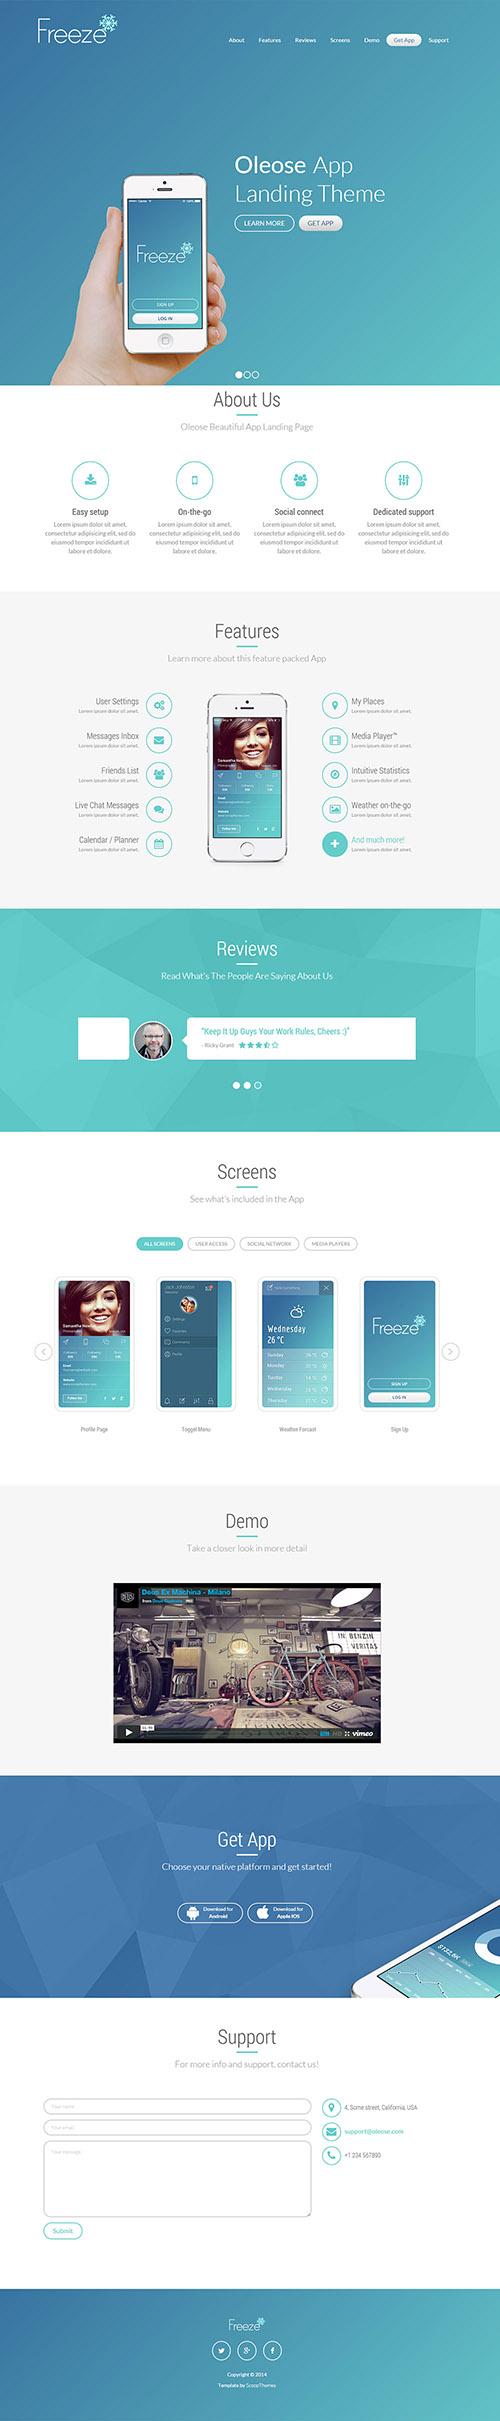 Sharefull.net – HTML Template – Oleose – App Bootstrap Landing Page ...